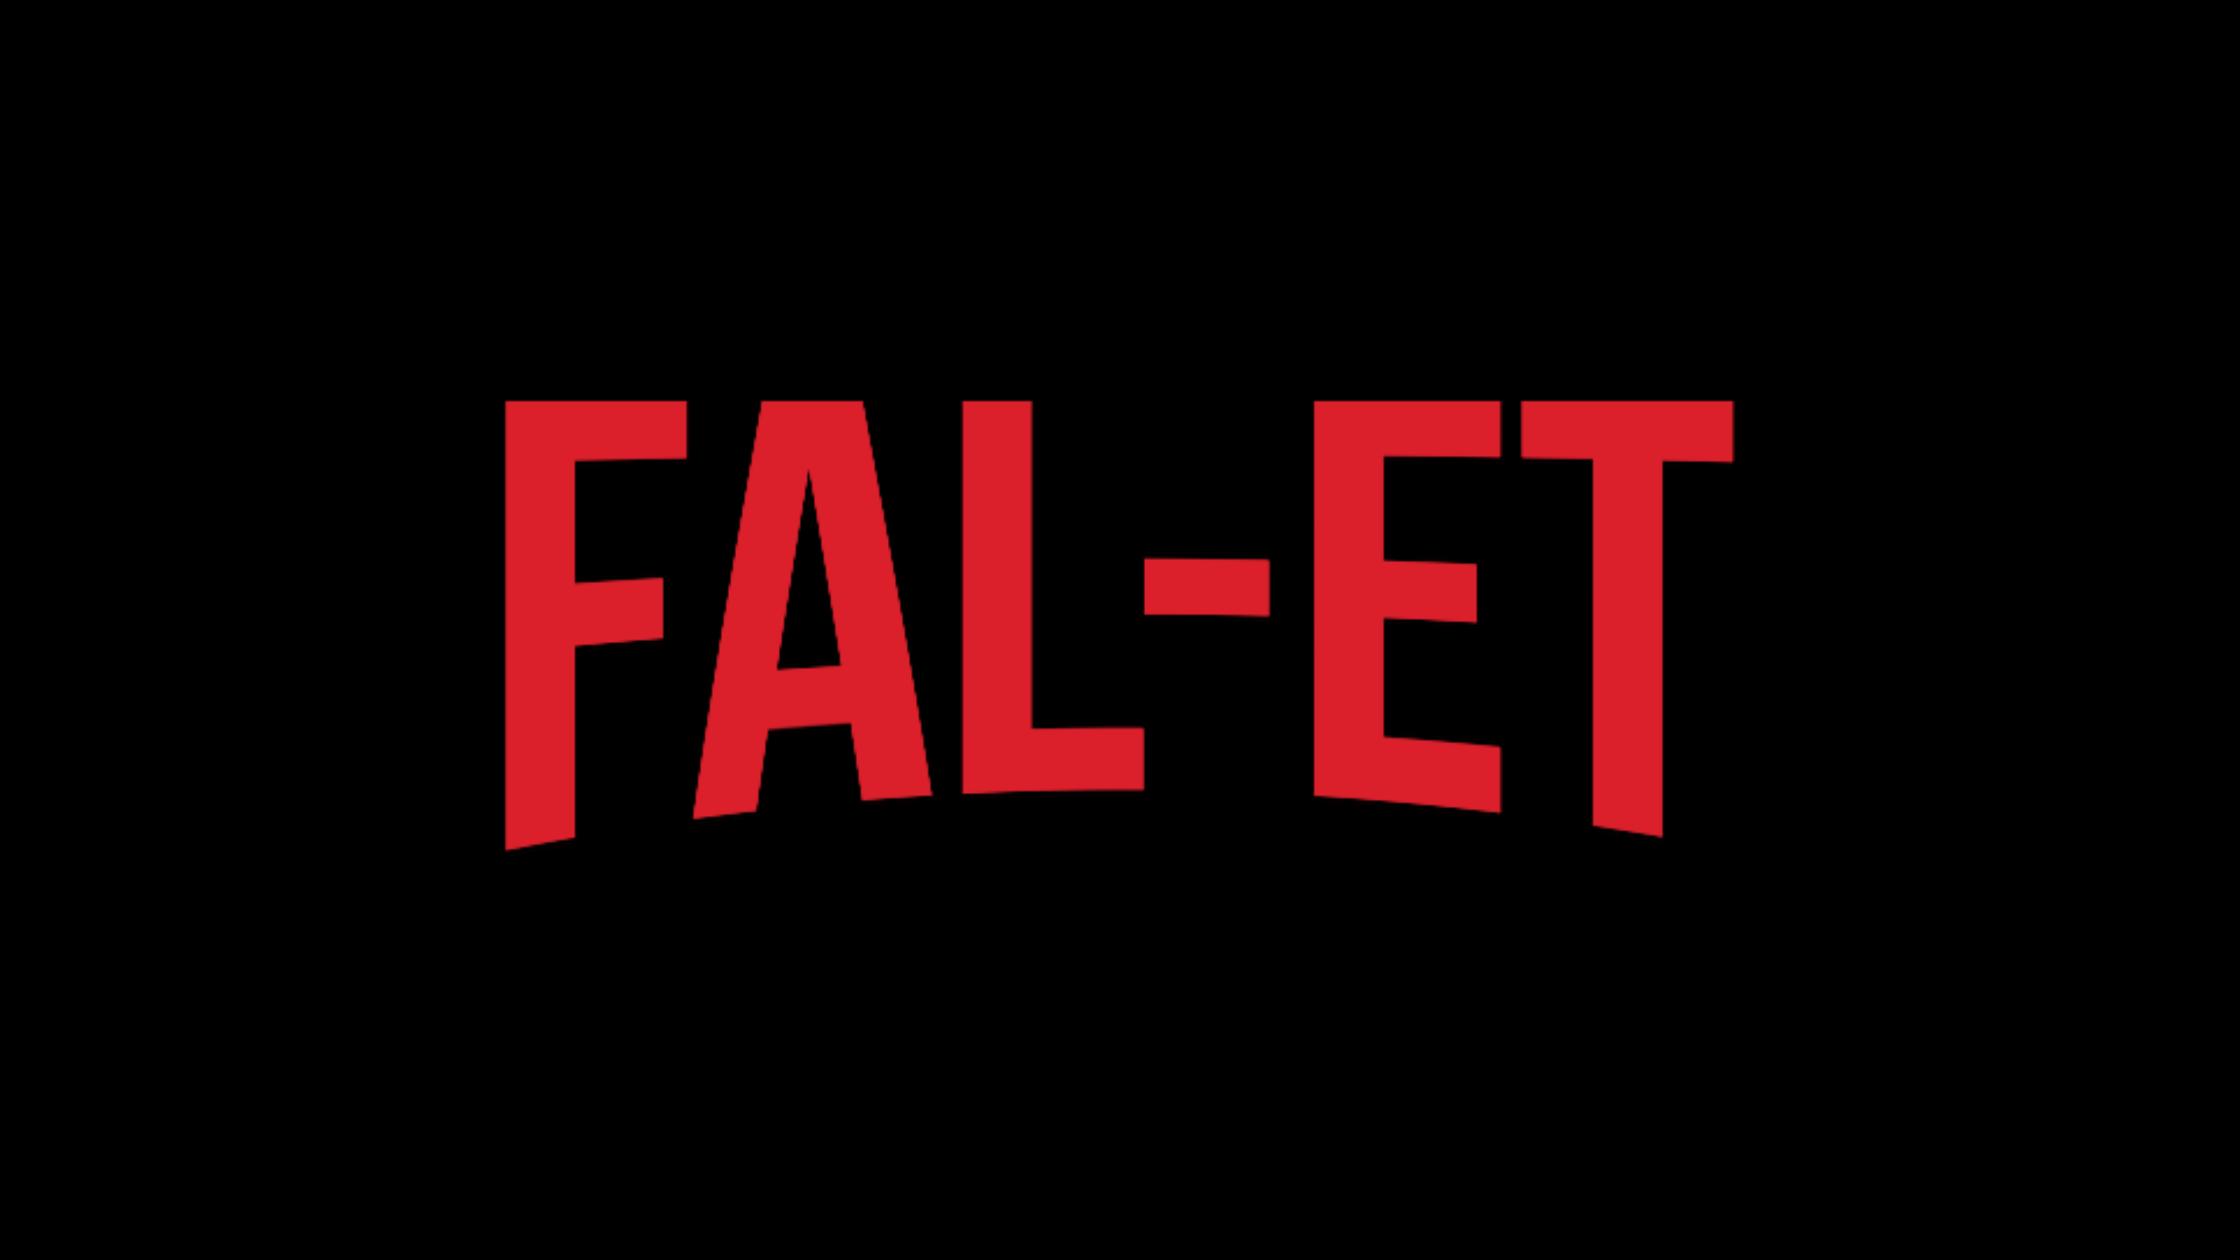 Text shows the pronunciation of 'Fallet': fal-et